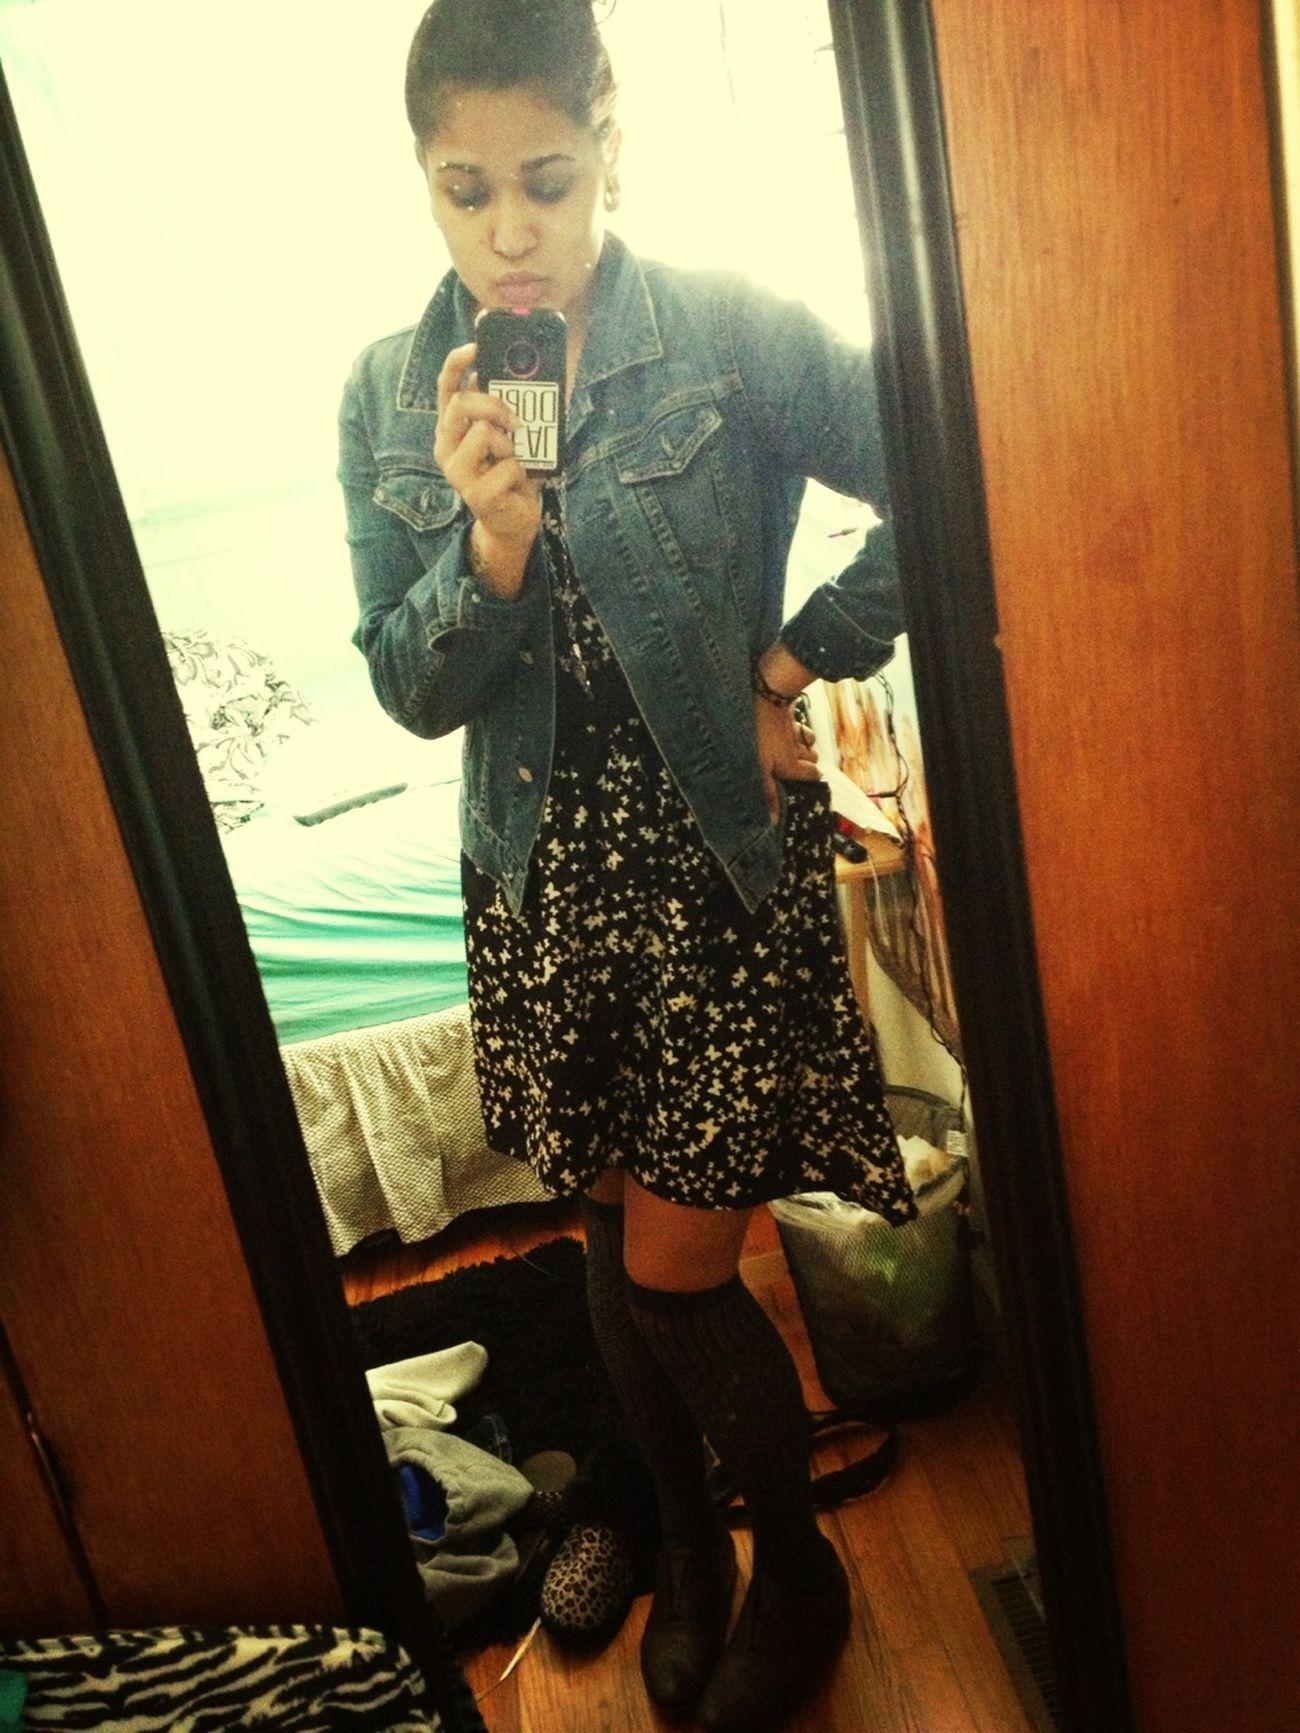 Lil hipster girl